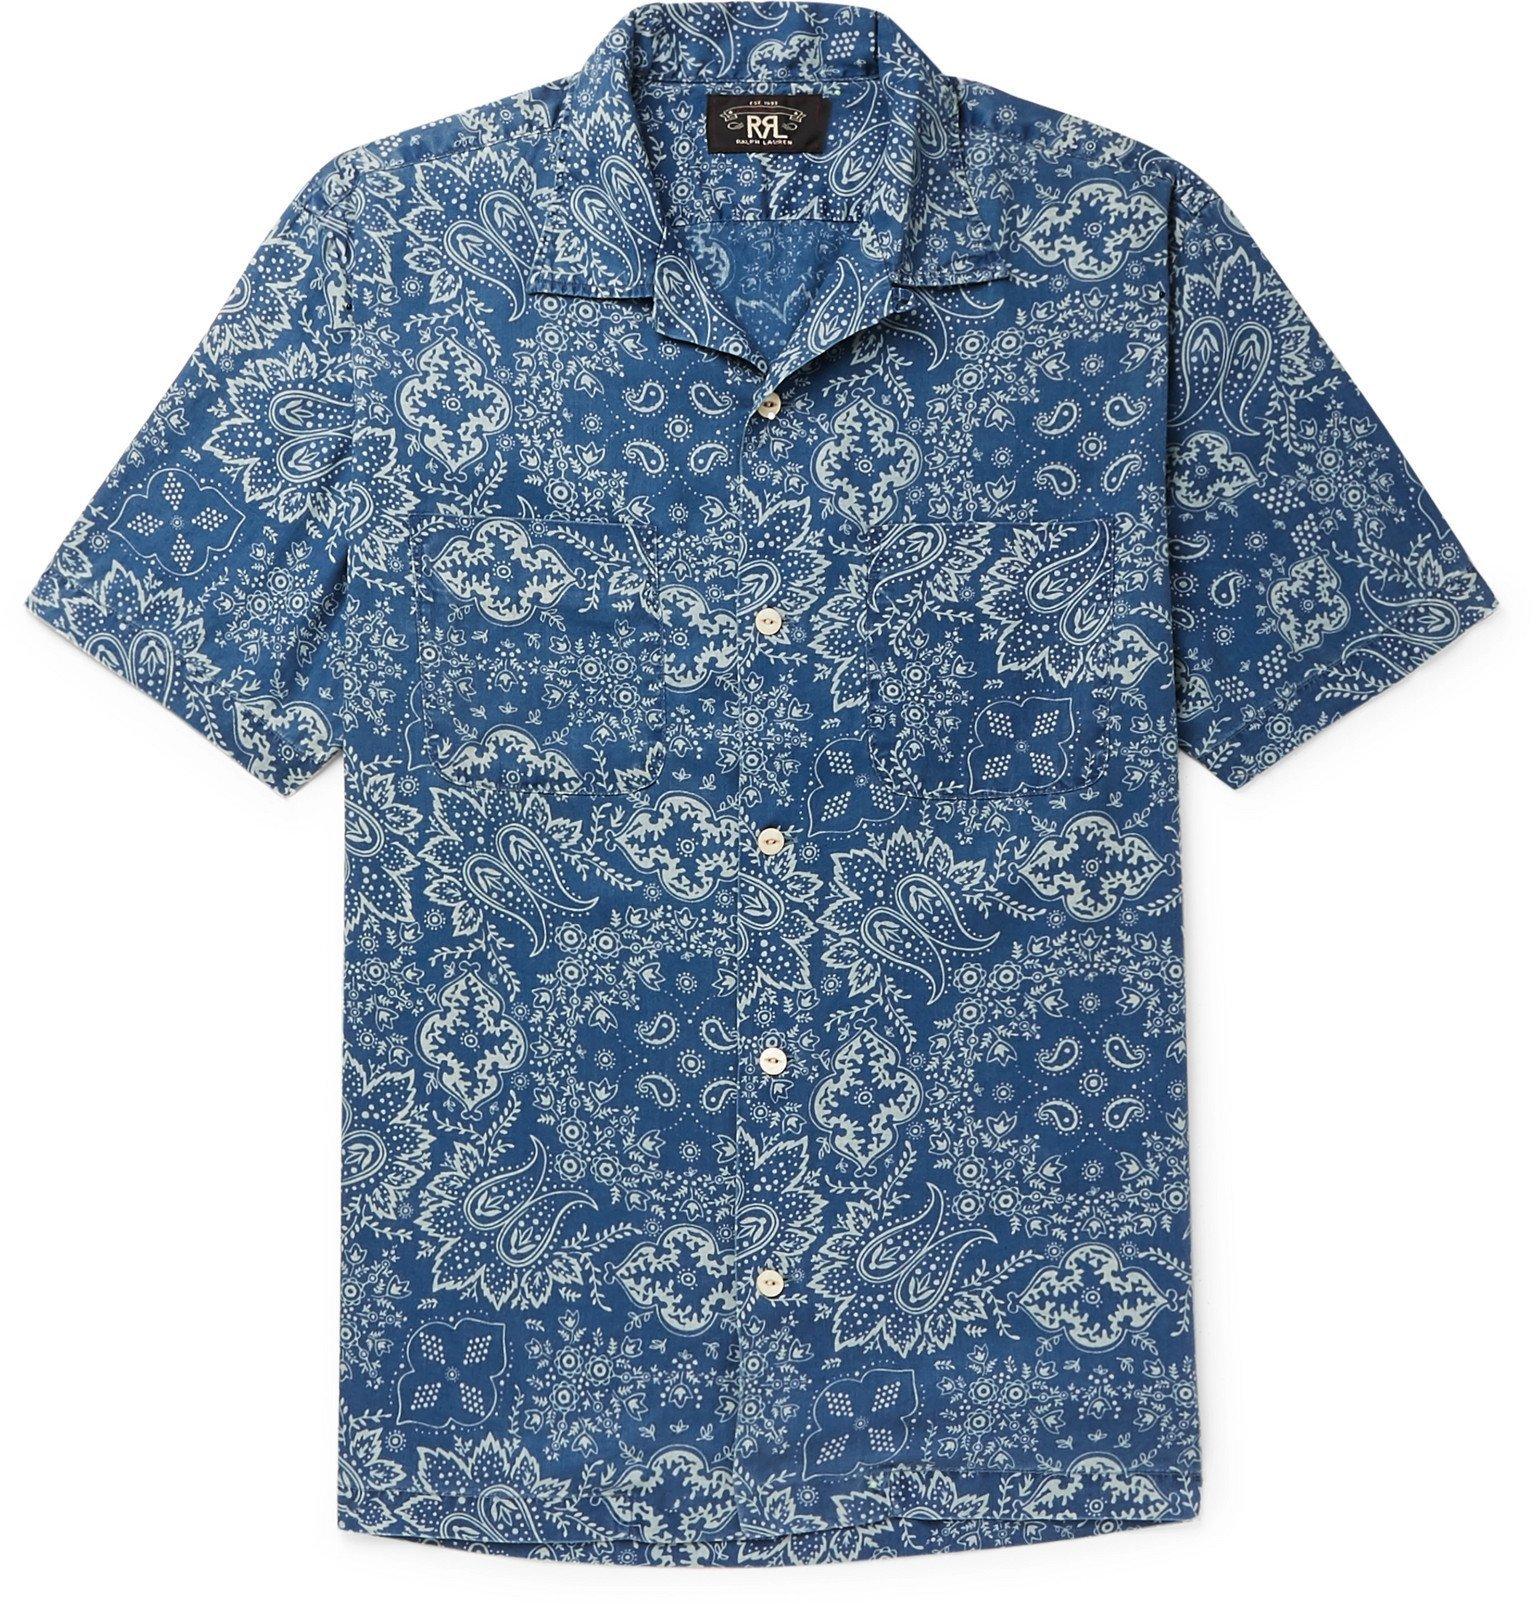 RRL - Camp-Collar Paisley-Print Lyocell Shirt - Blue